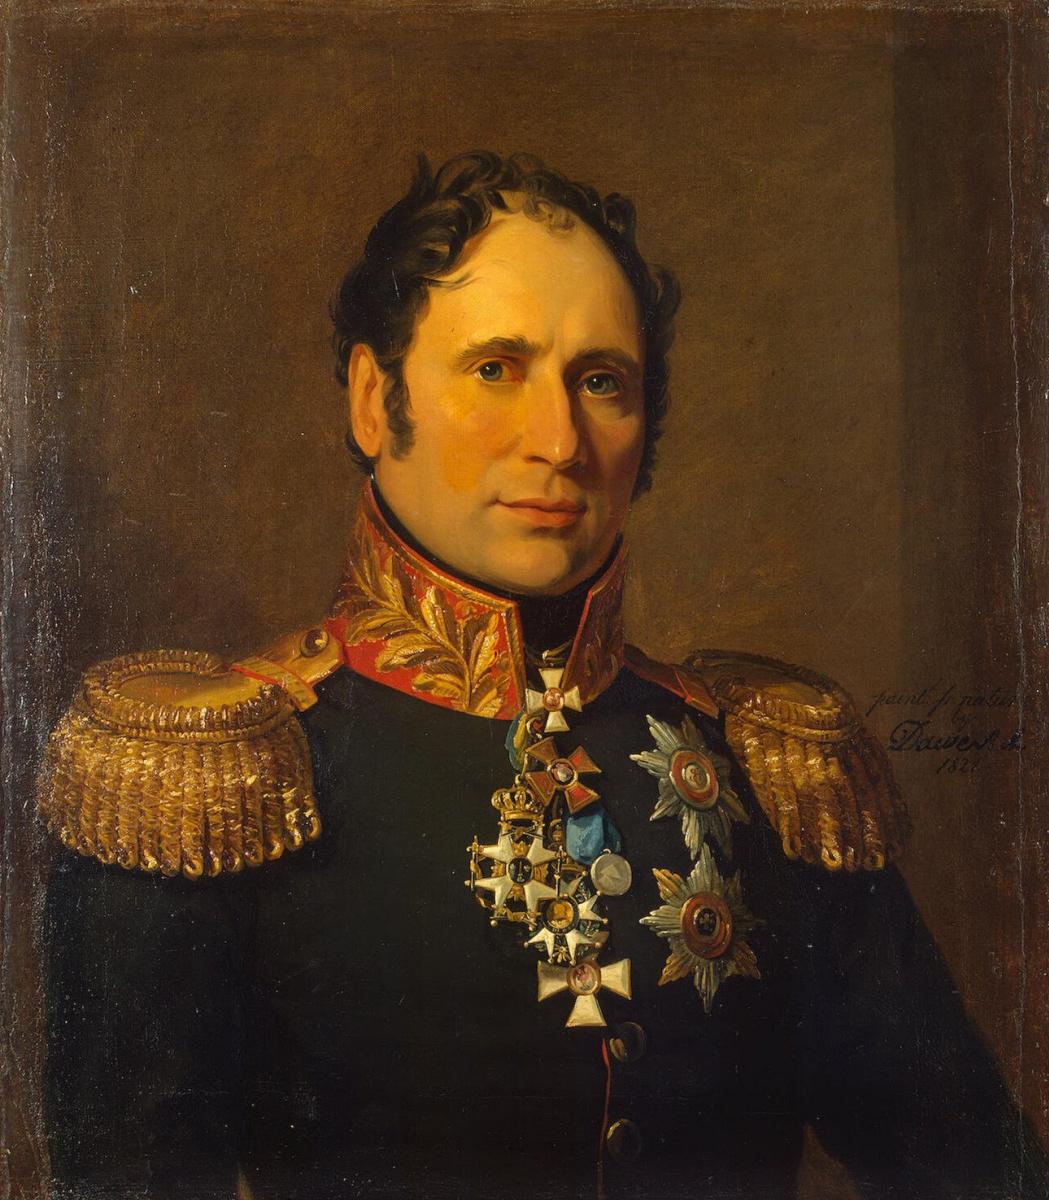 George Dow. Portrait of Karl Ivanovich Opperman